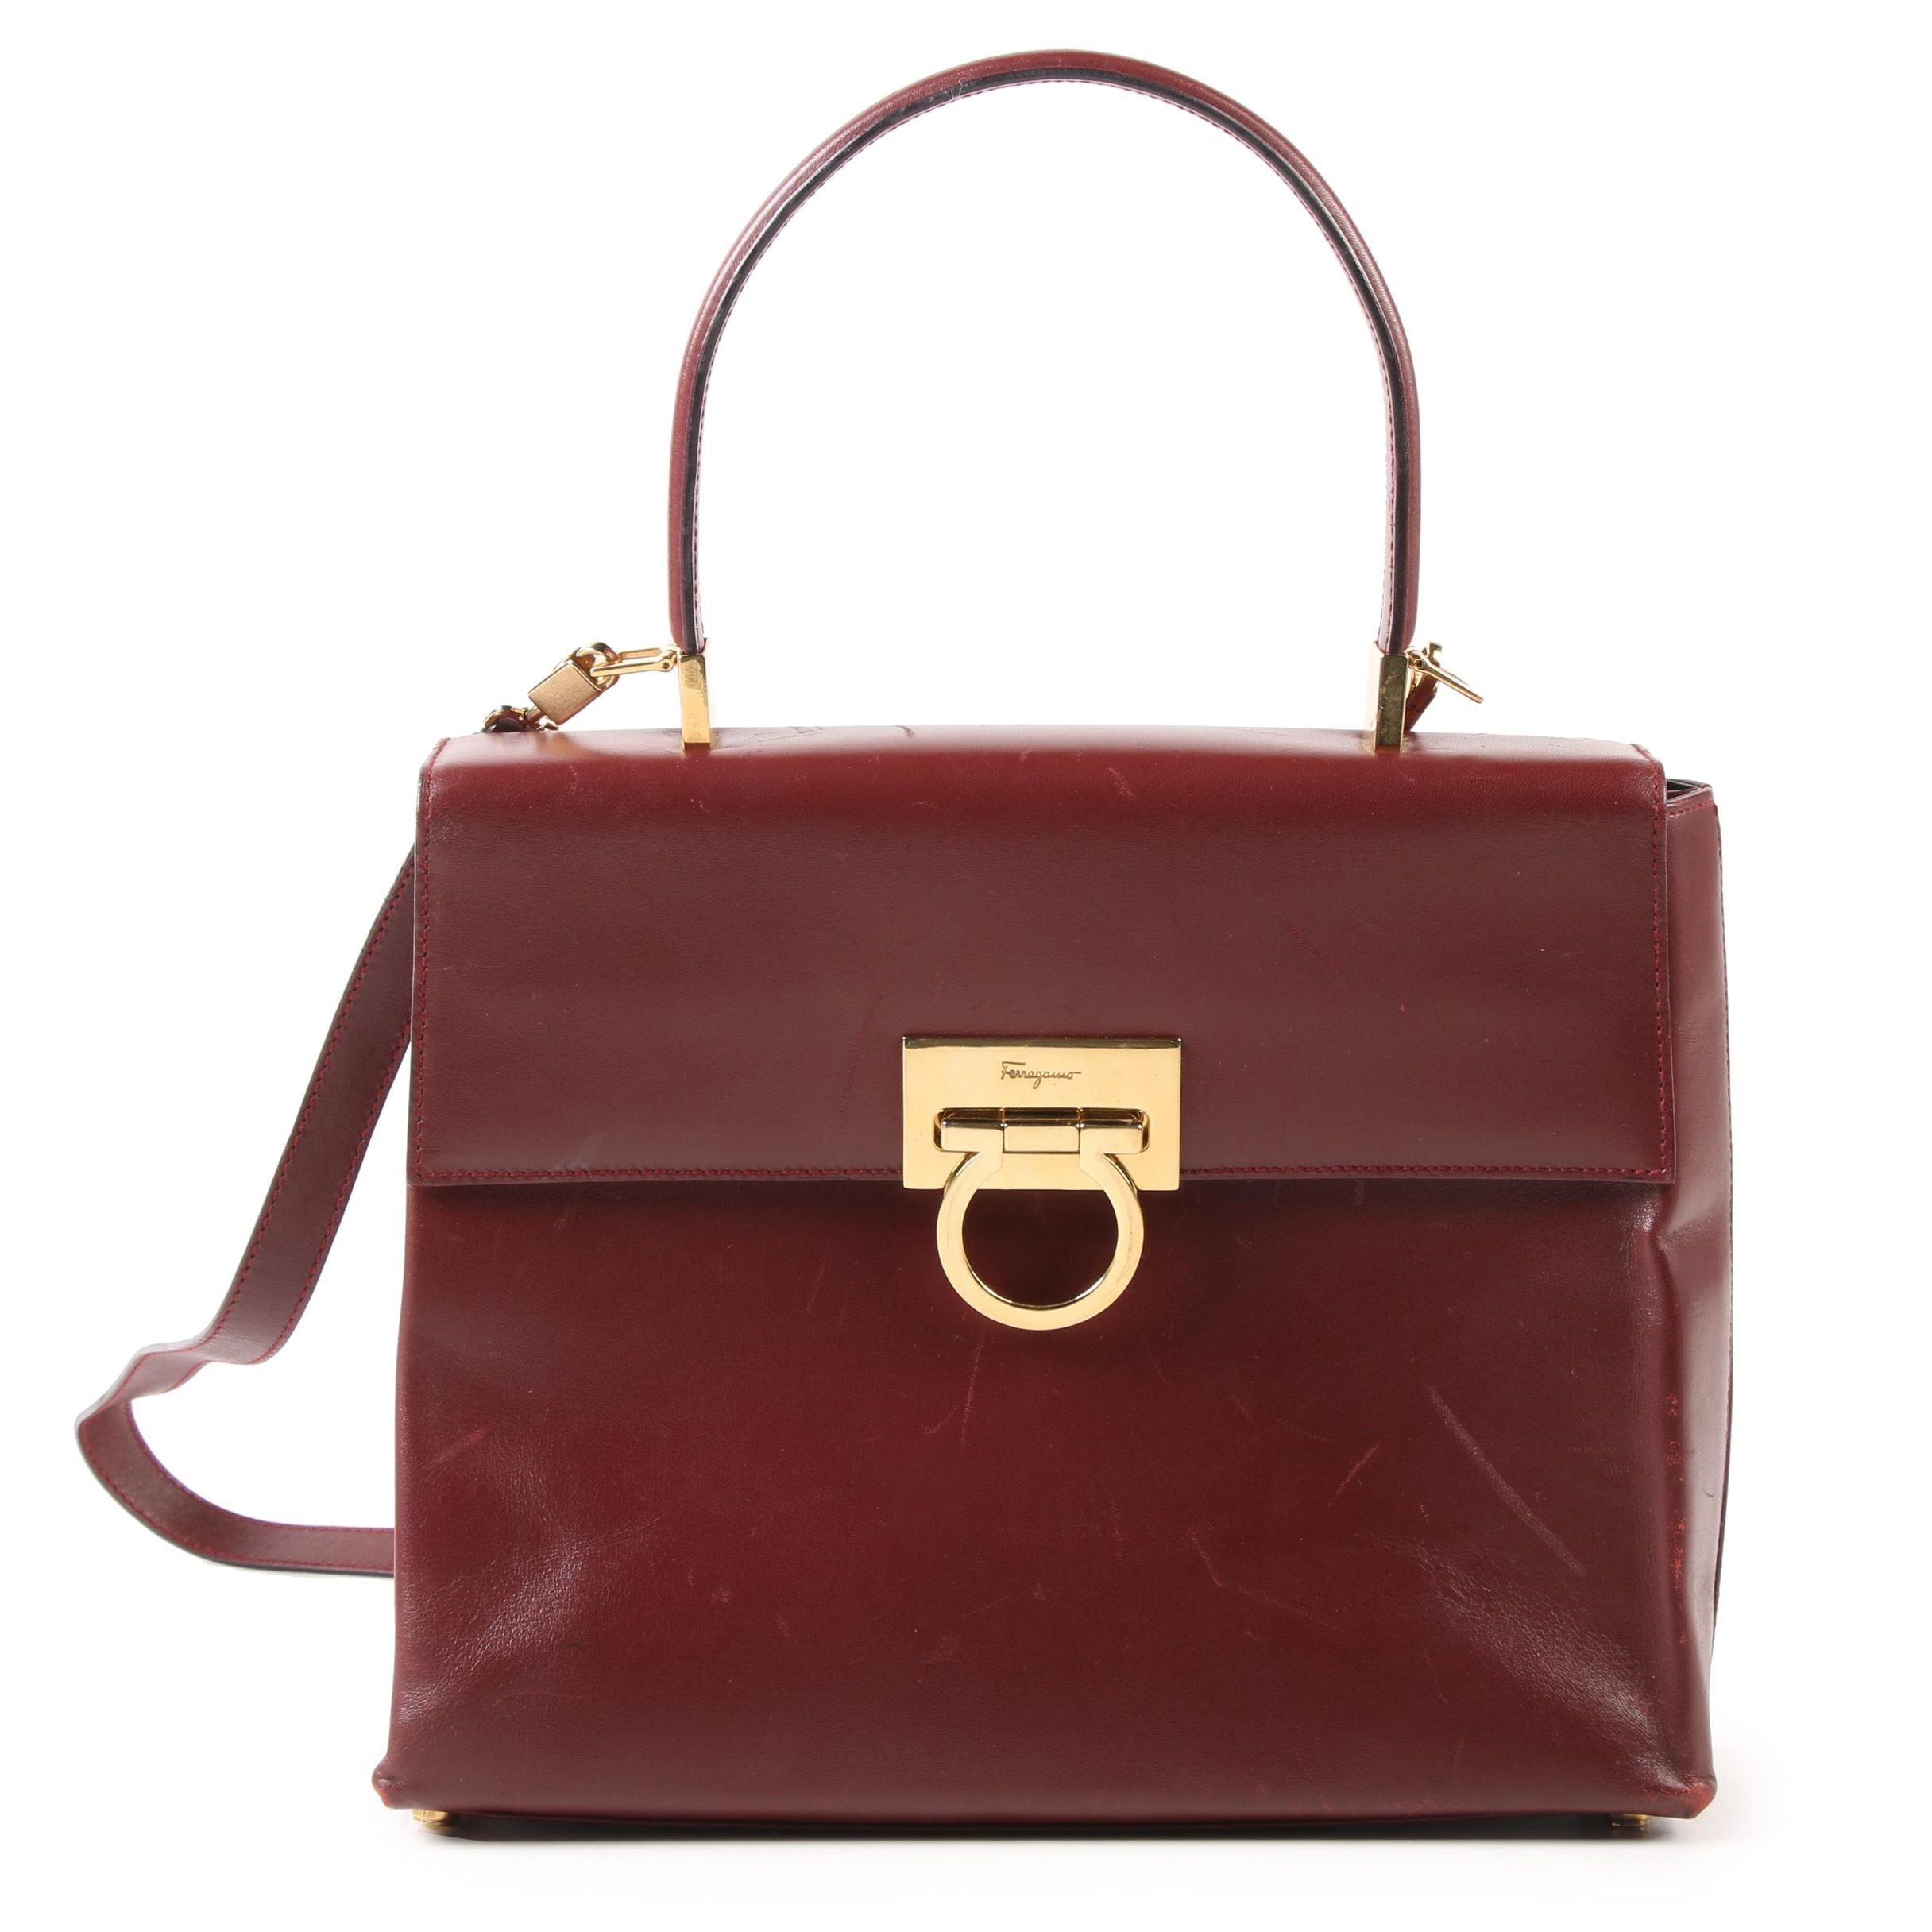 Salvatore Ferragamo Burgundy Leather Convertible Handbag, Vintage